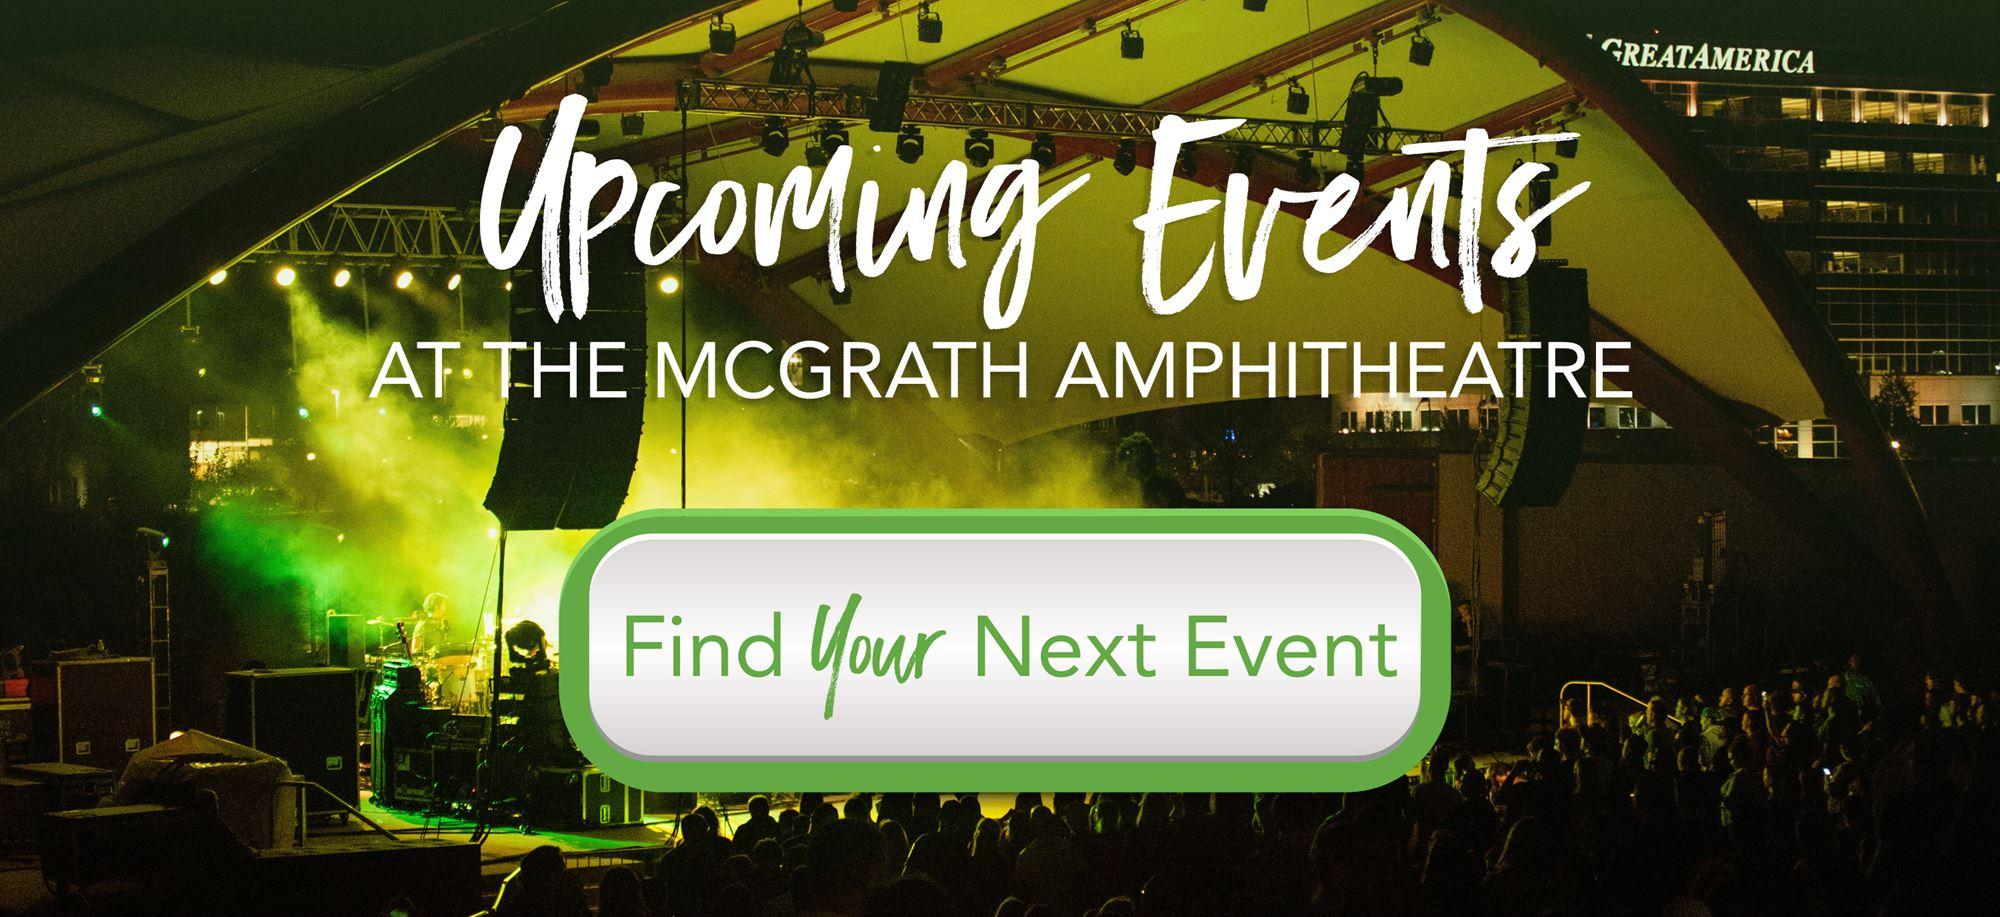 Events at the McGrath Amphitheatre in Cedar Rapids Iowa